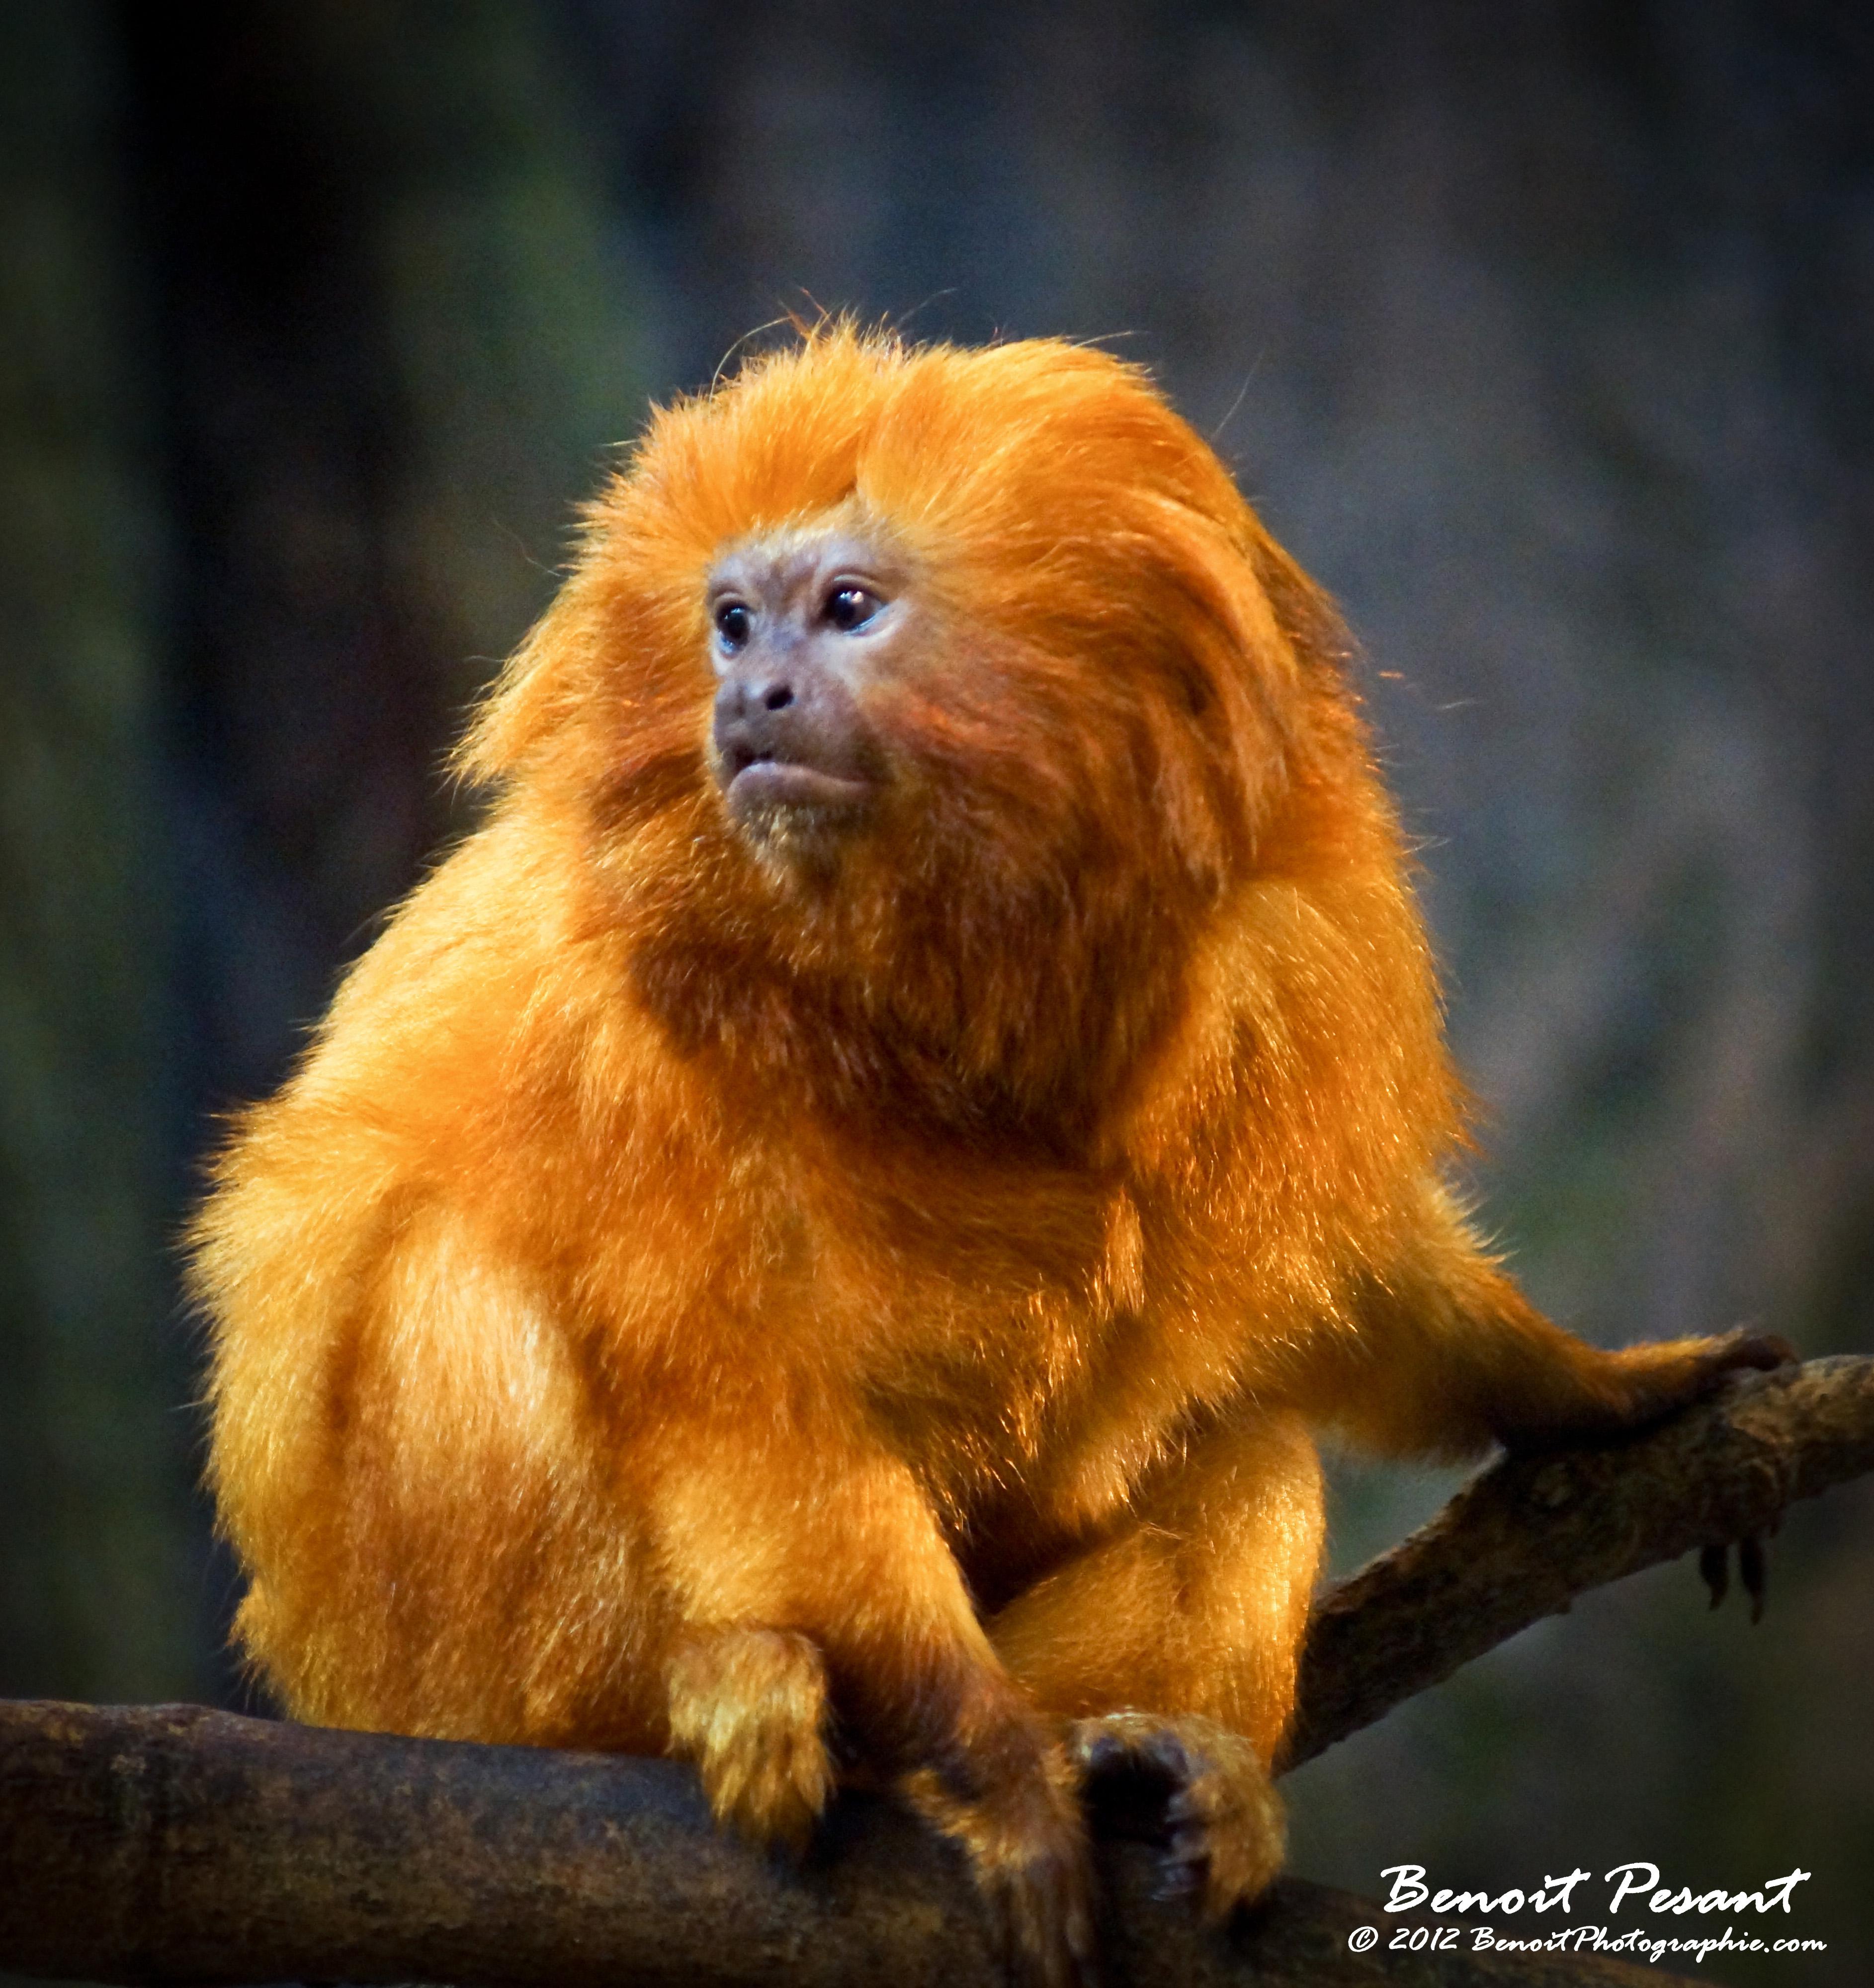 Blavatsky Nessie ♥ Tamarin_lion_dore_005_by_benoitphotographie-d59muz3